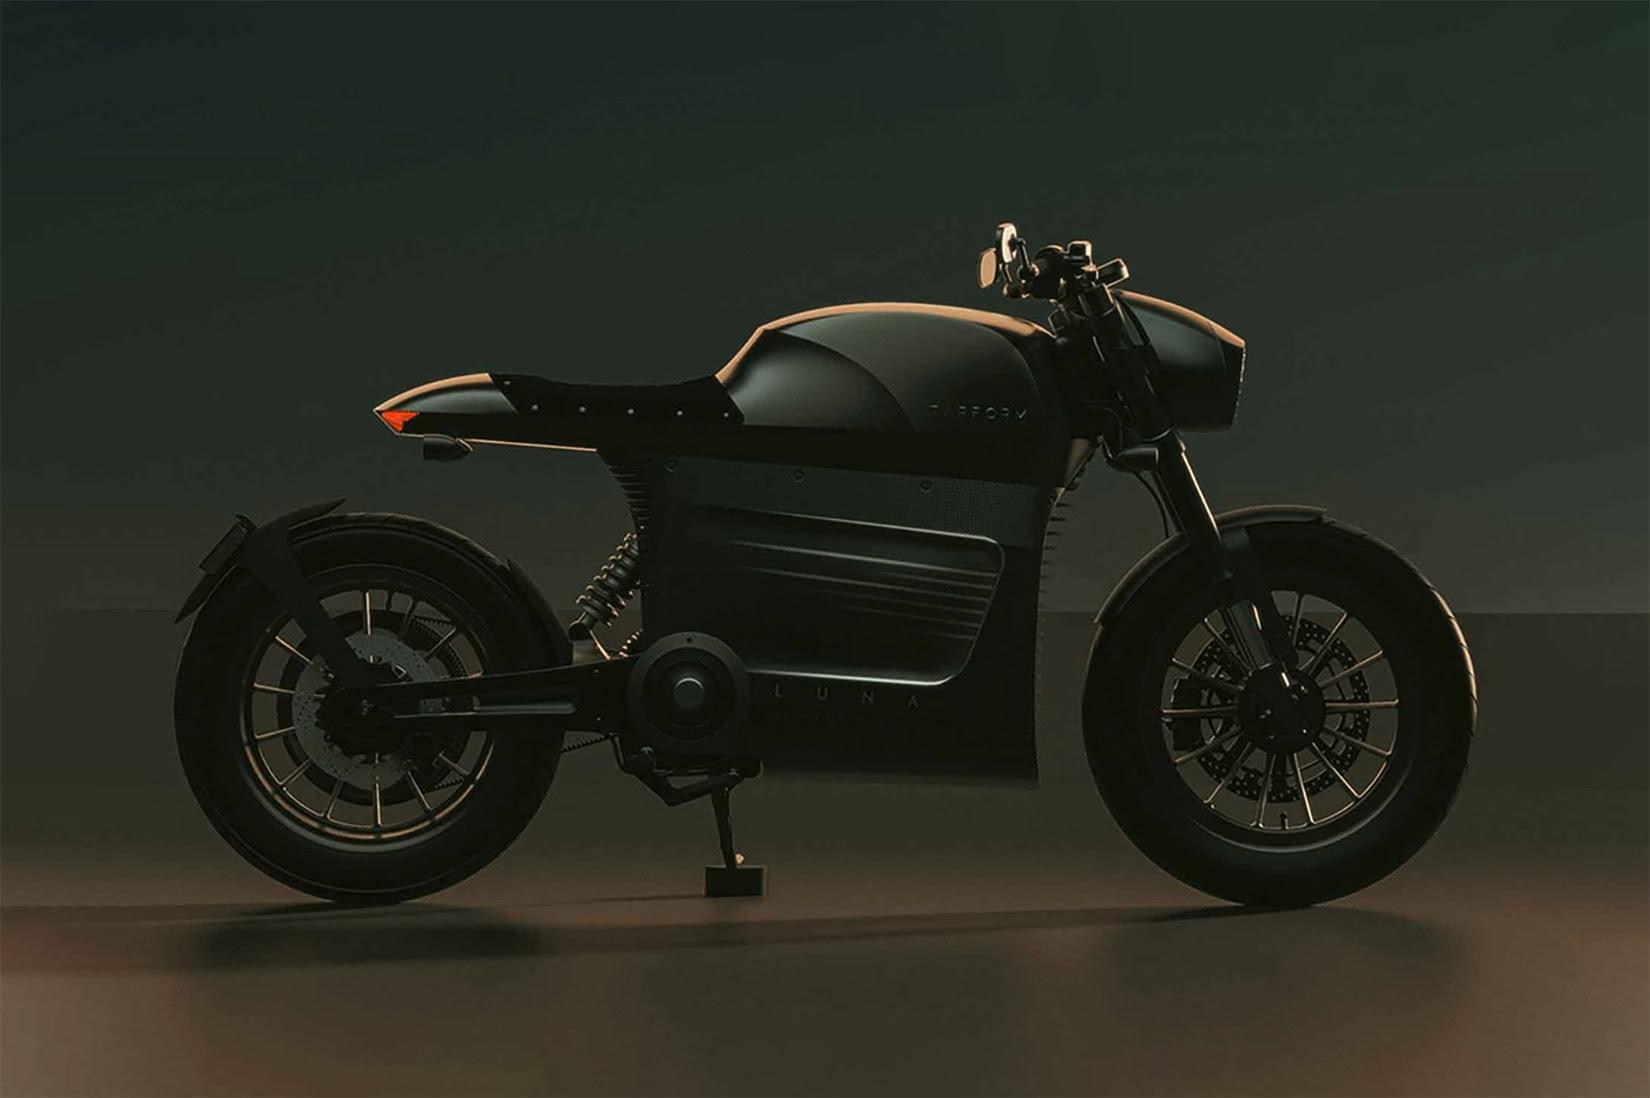 best electric motorcycles 2021 luxury Tarform - Luxe Digital